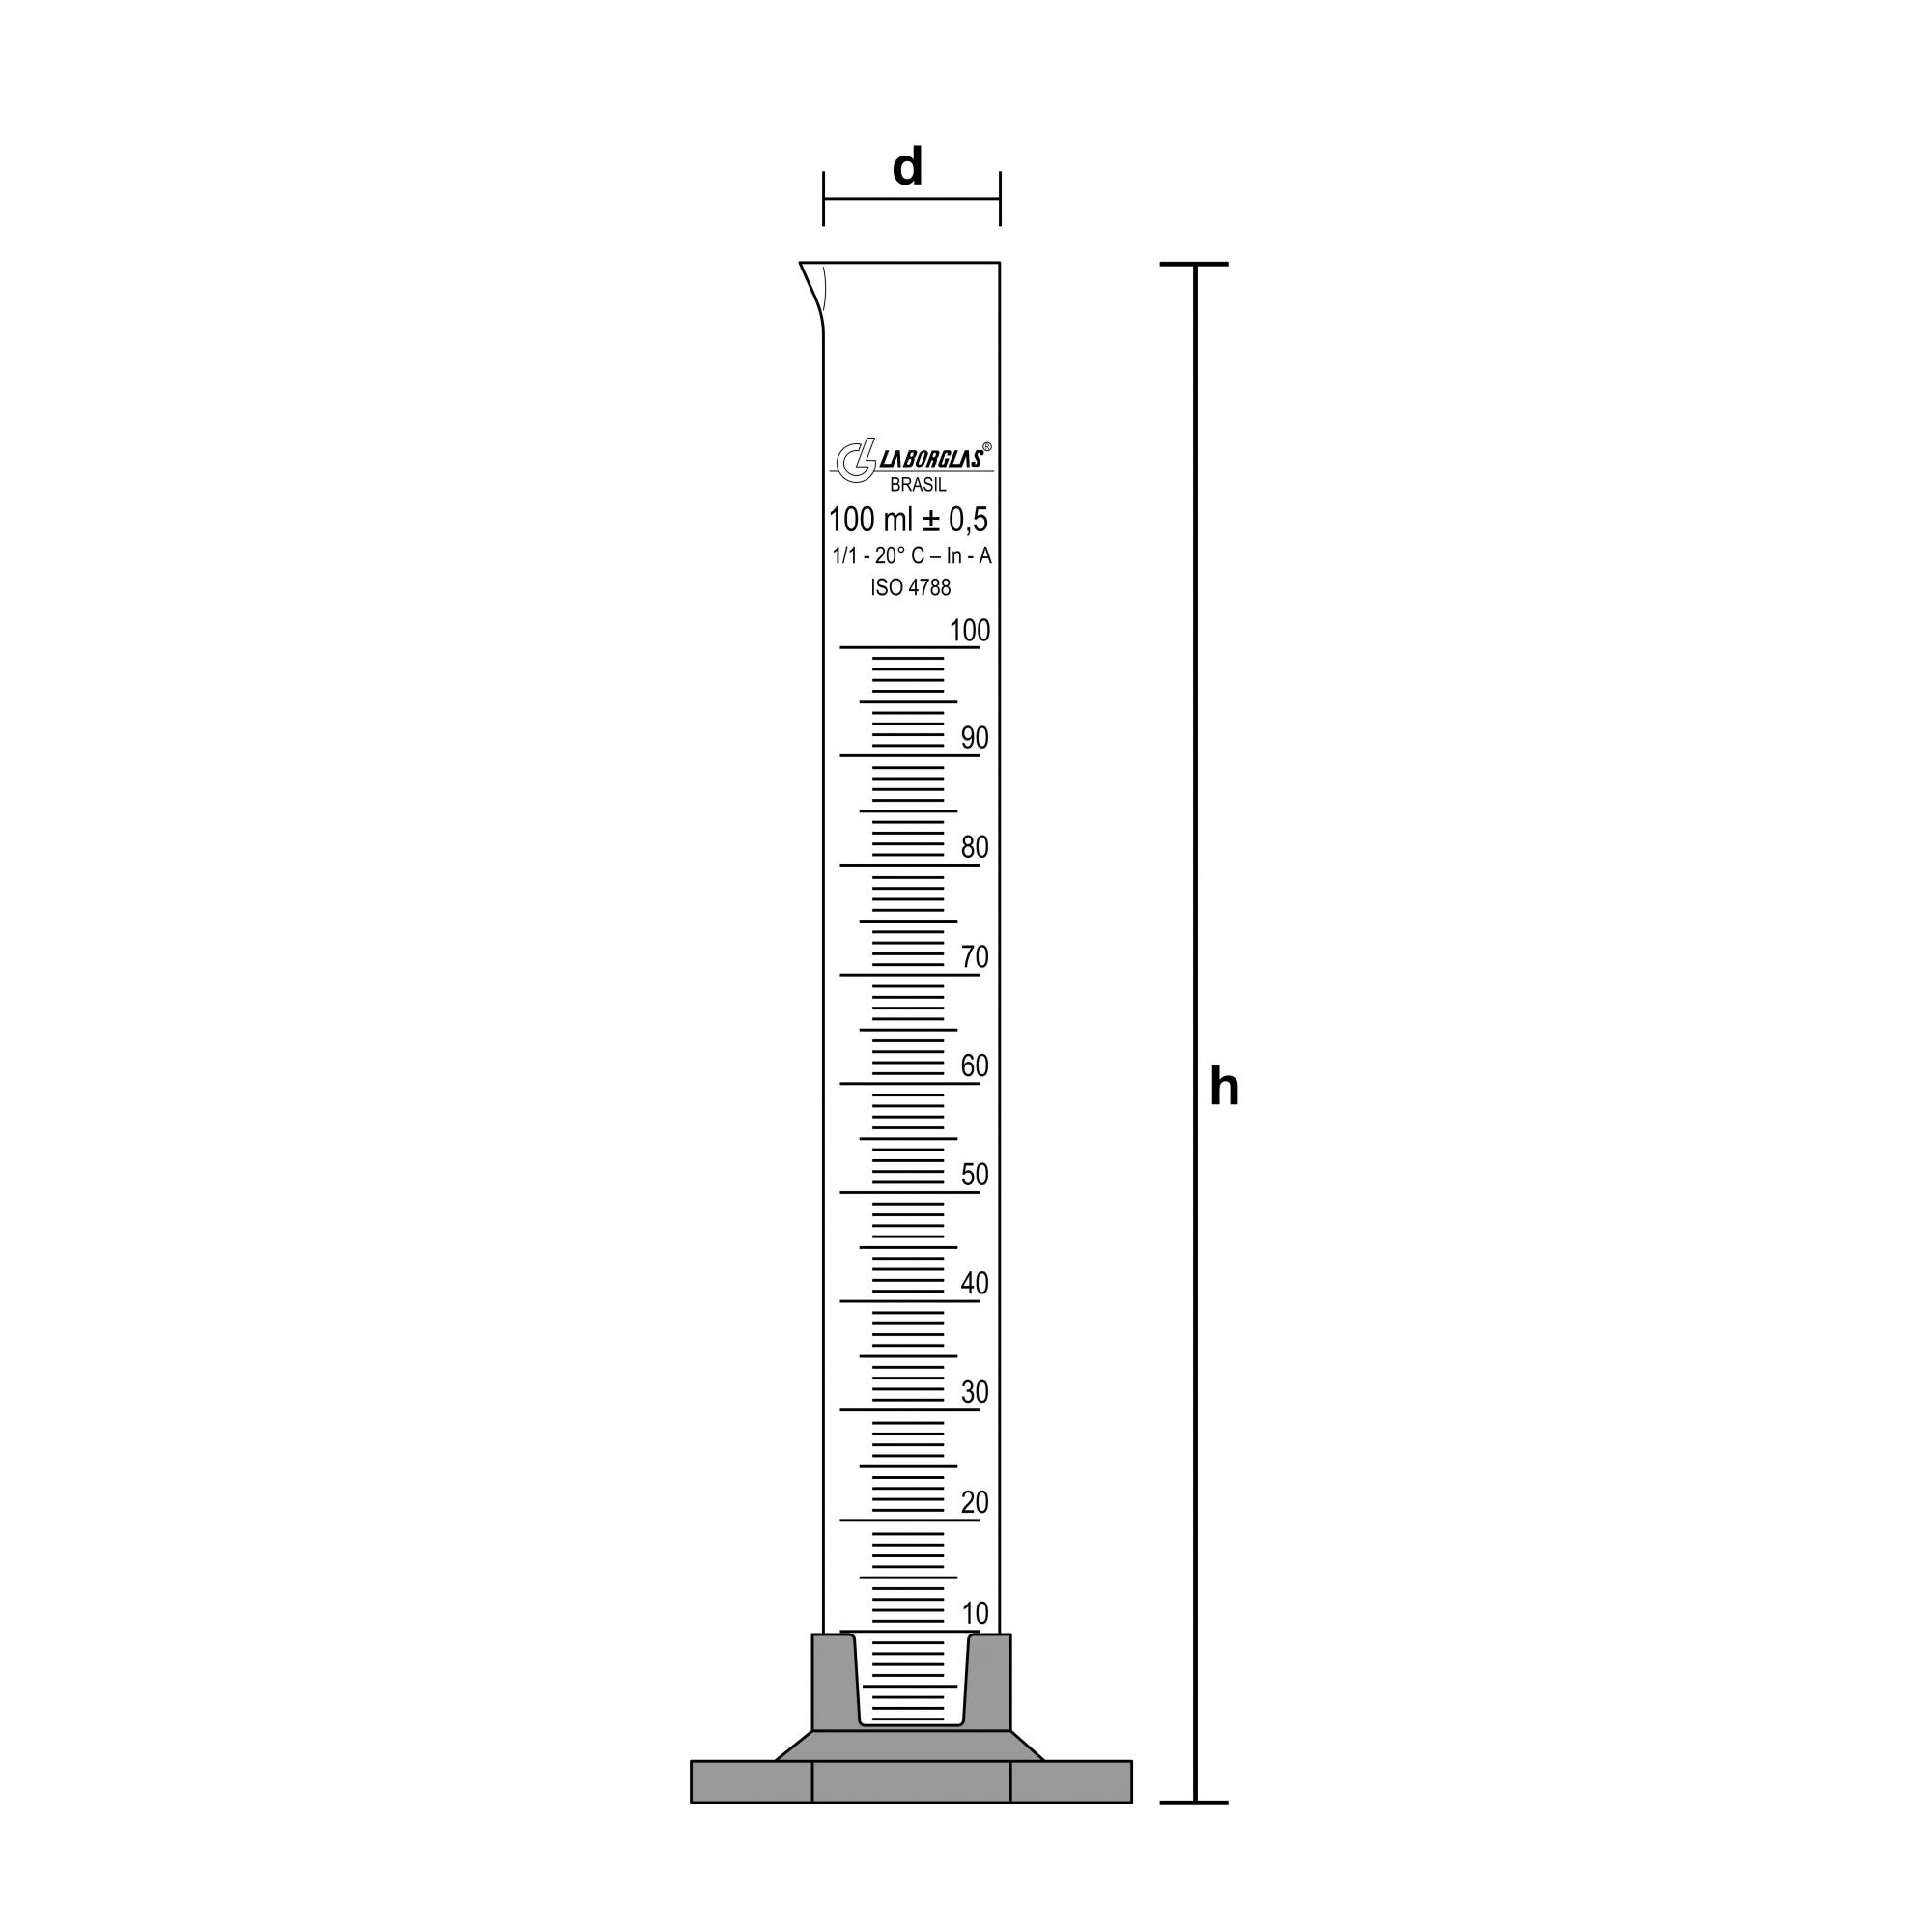 PROVETA GRADUADA BASE HEXAGONAL DE POLIPROPILENO CLASSE A 2000 ML - Laborglas - Cód. 9138763